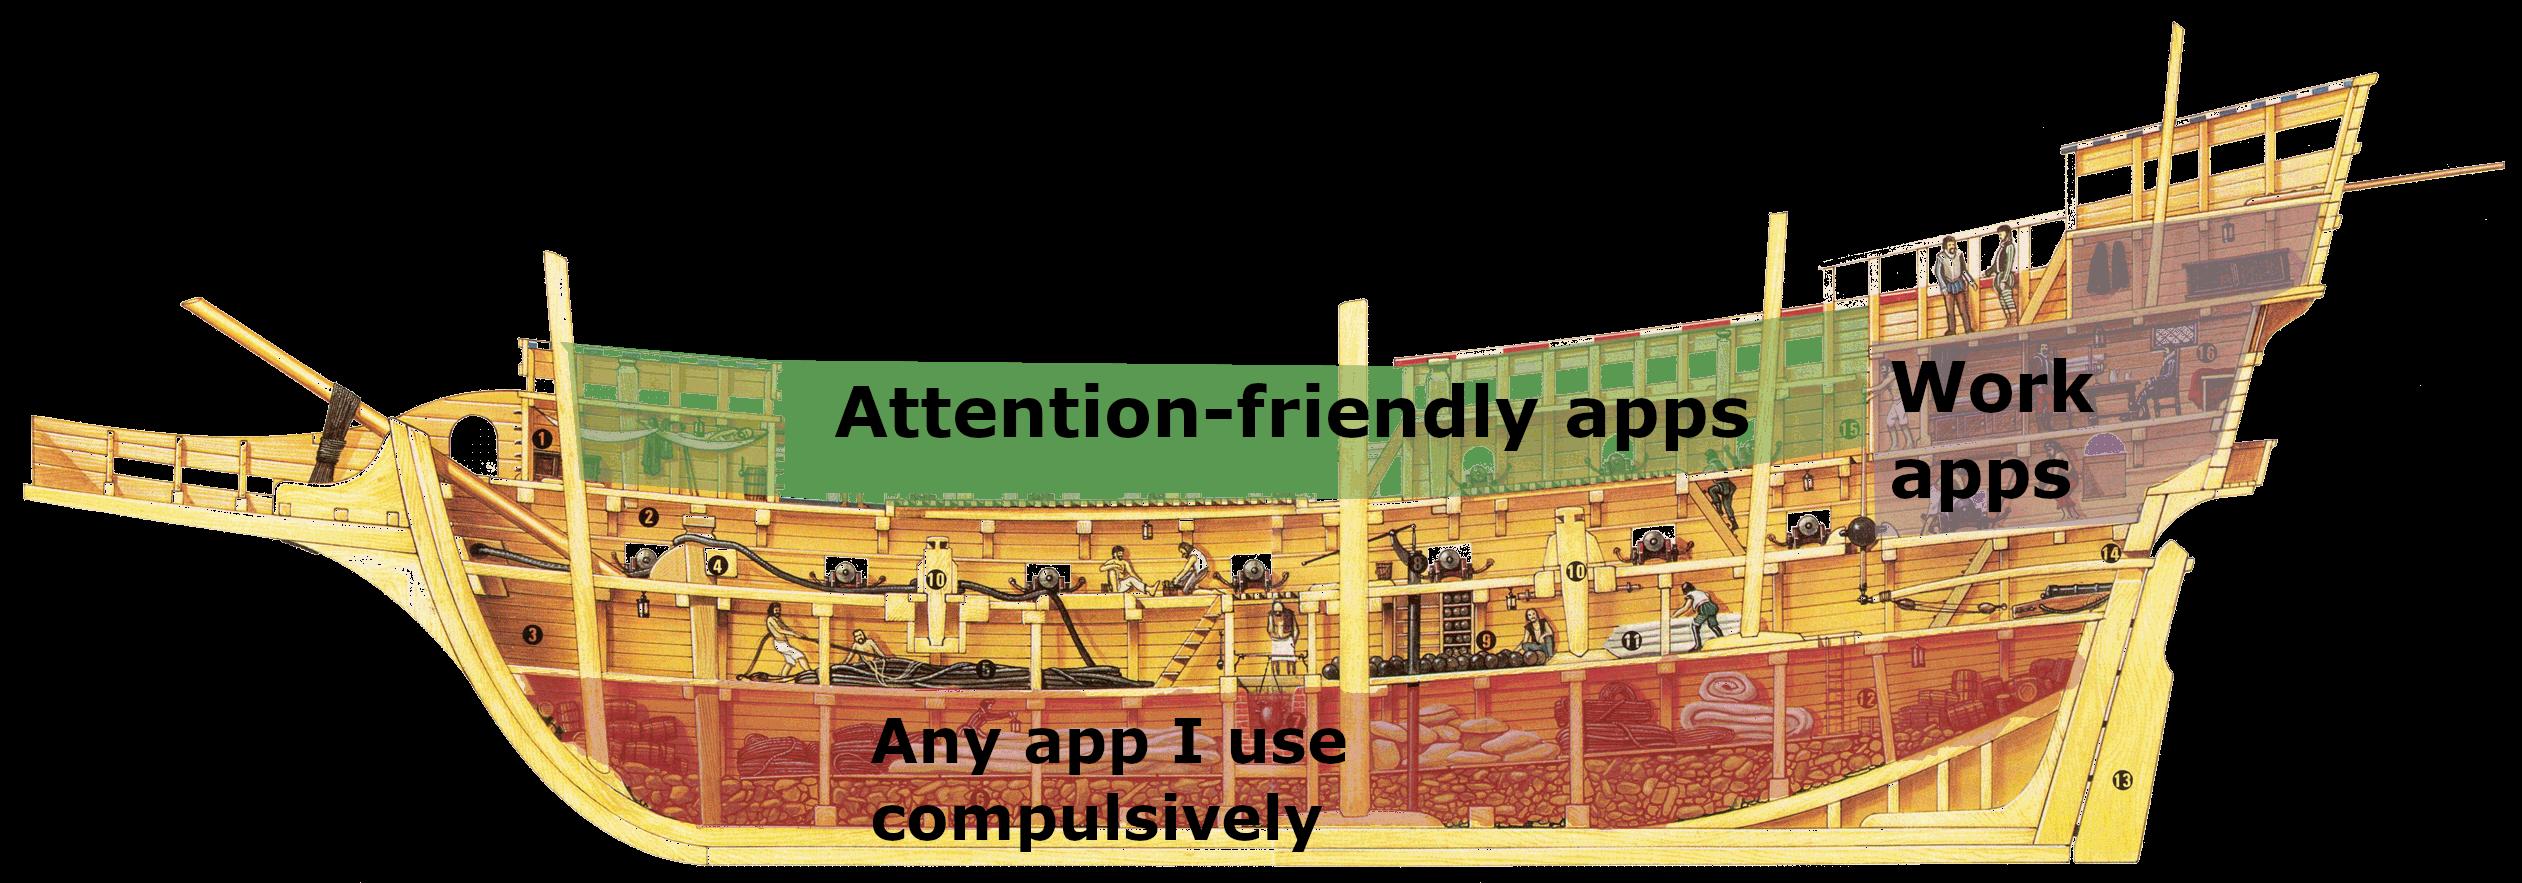 Mobile app isolation